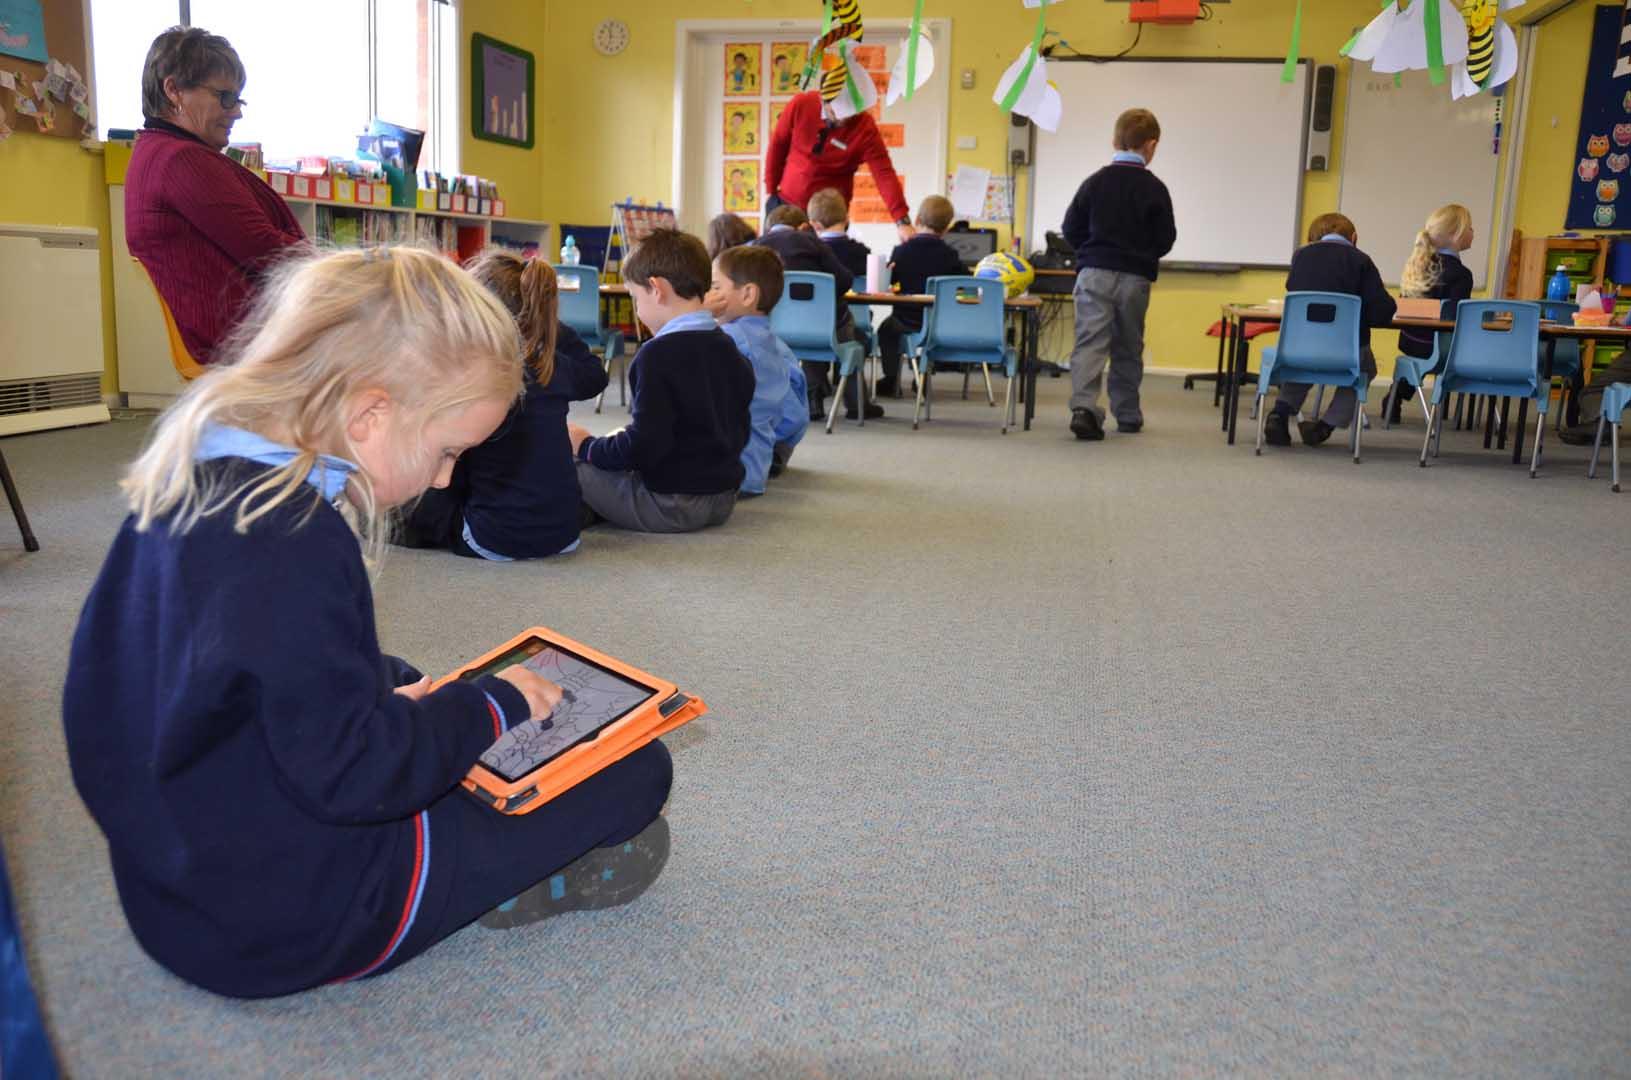 St-Patricks-walcha-classroom79